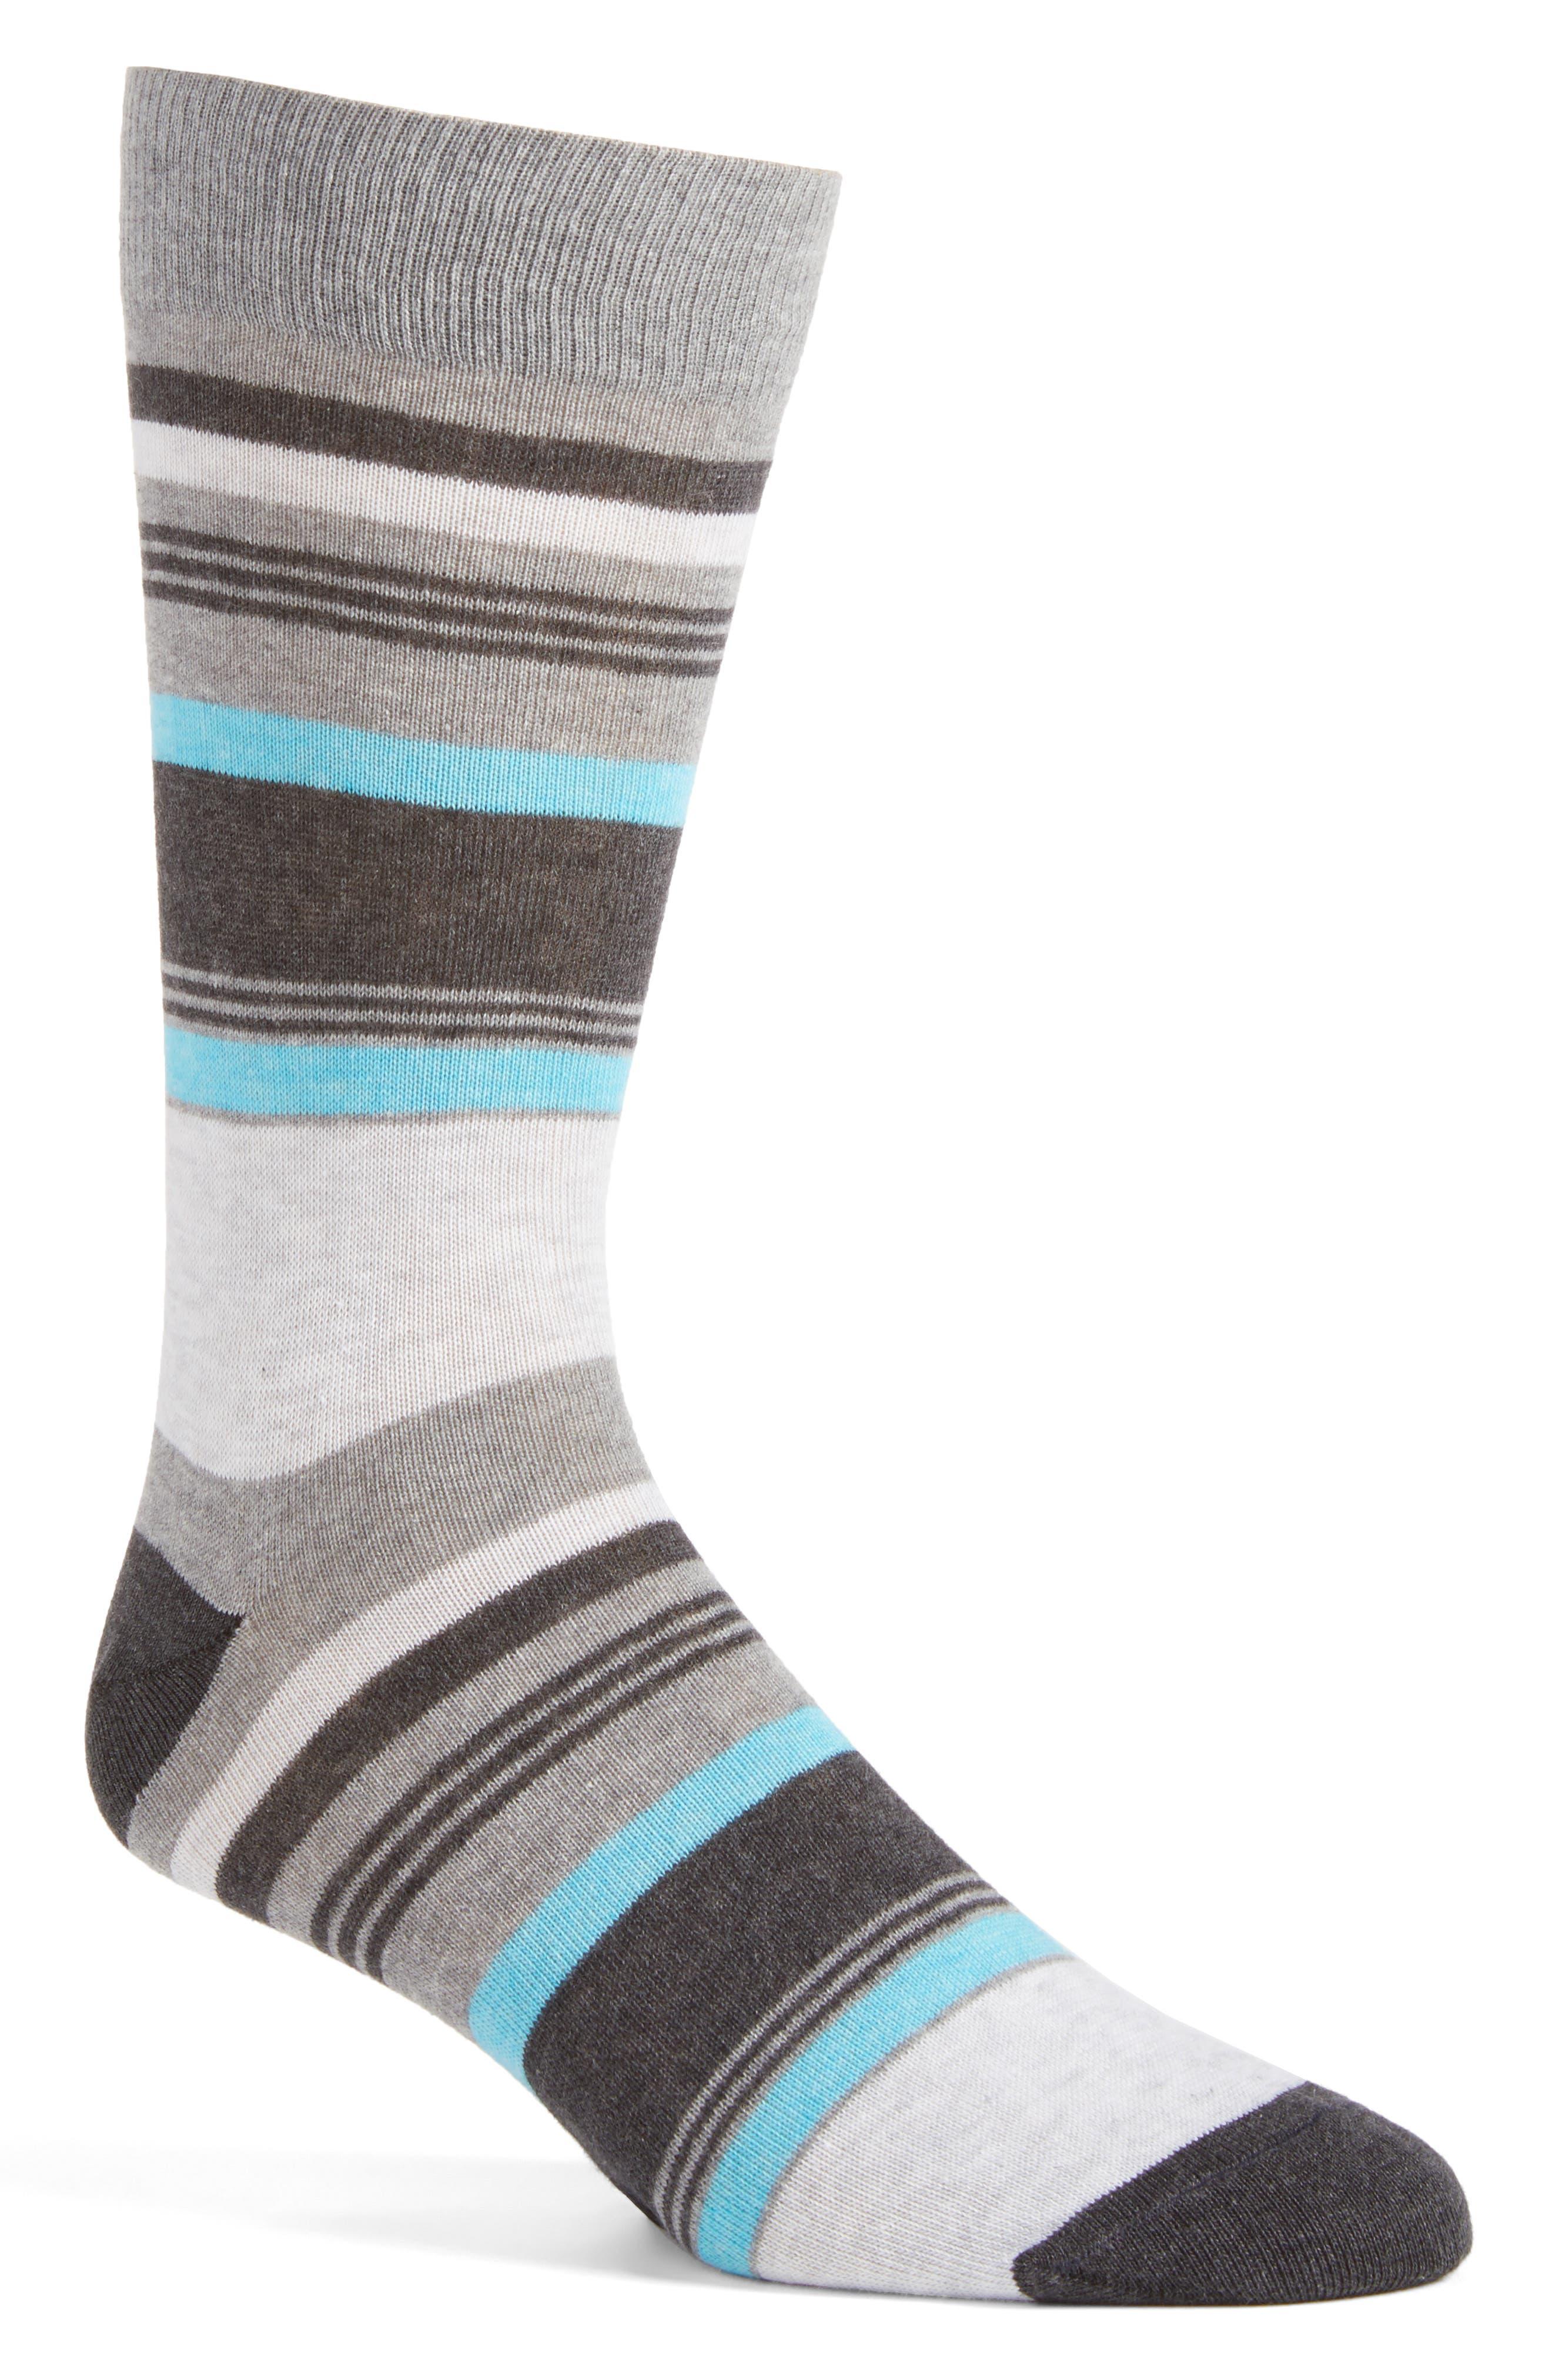 Lorenzo Uomo Variety Stripe Crew Socks